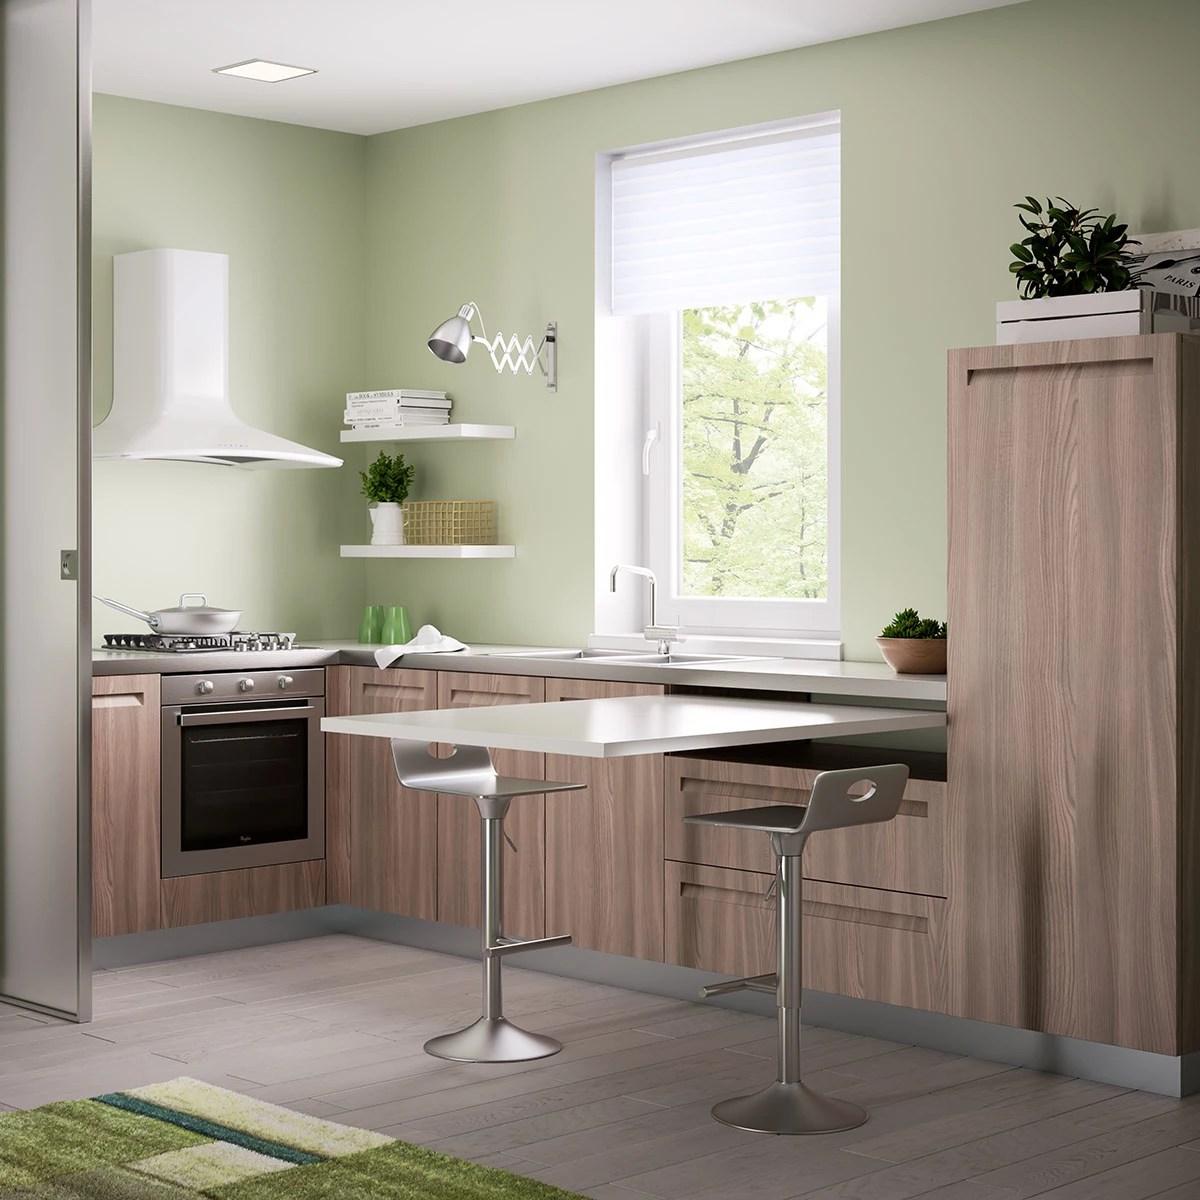 Mobili Cucina Componibili On Line Top Mobili Cucina